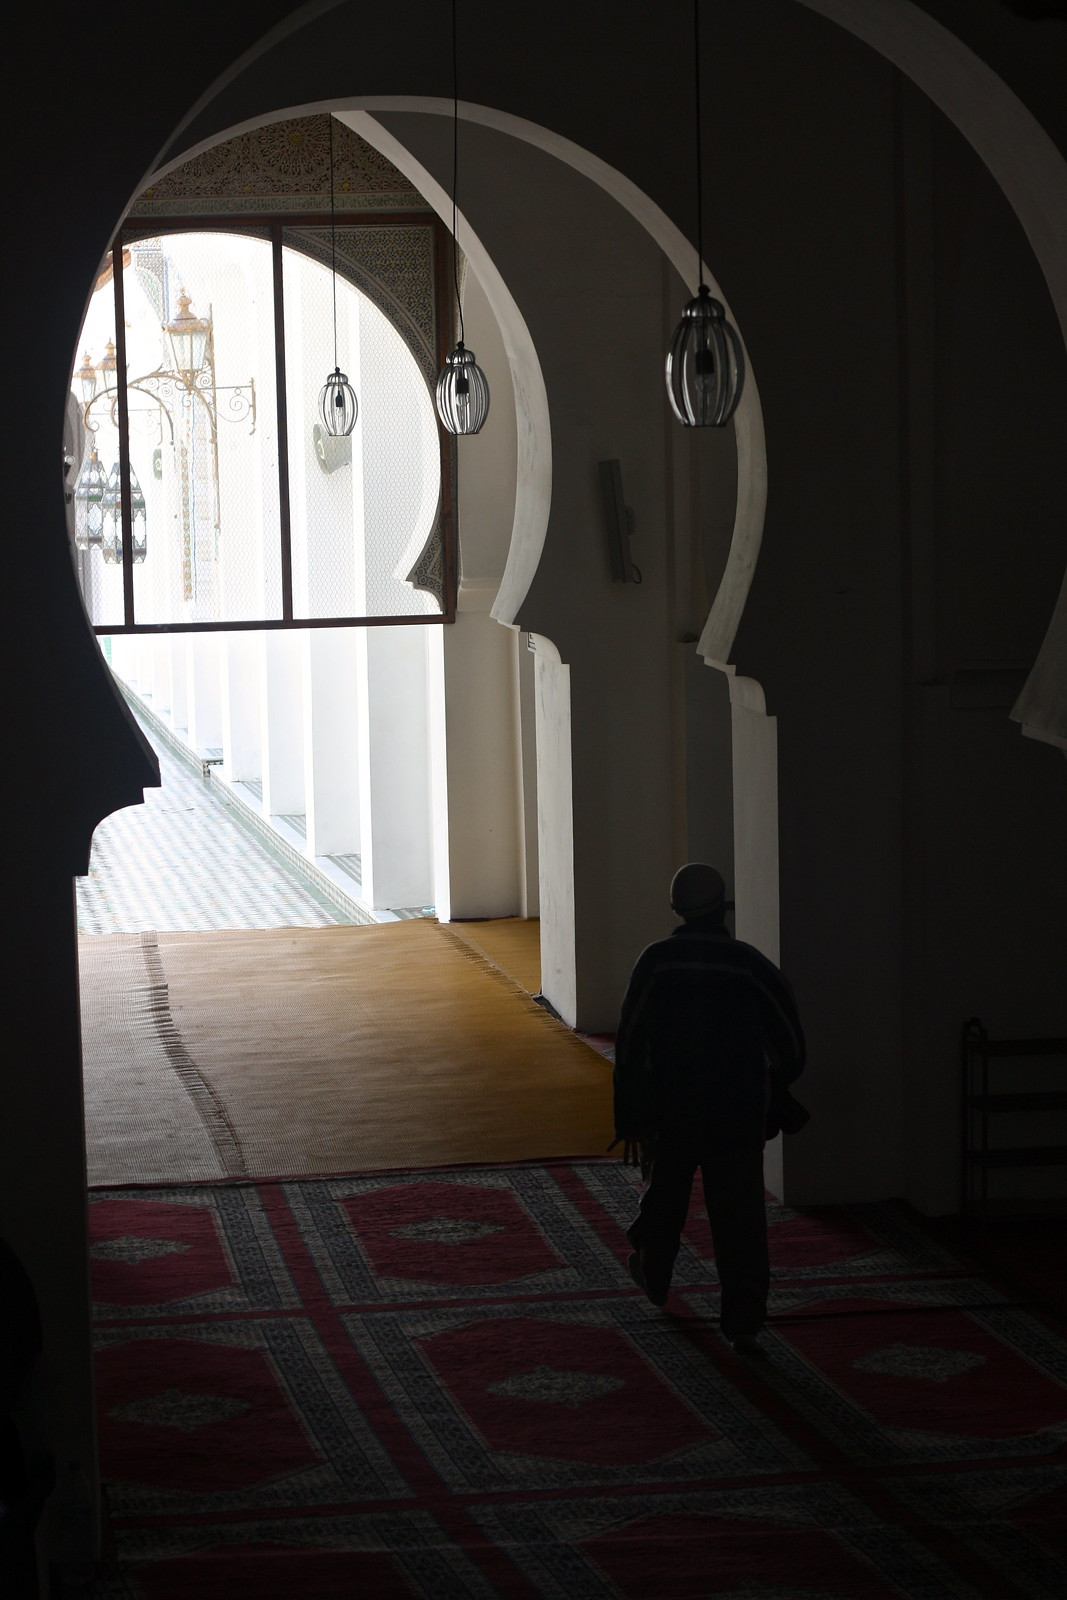 Kairaouine University, Fez, Morocco